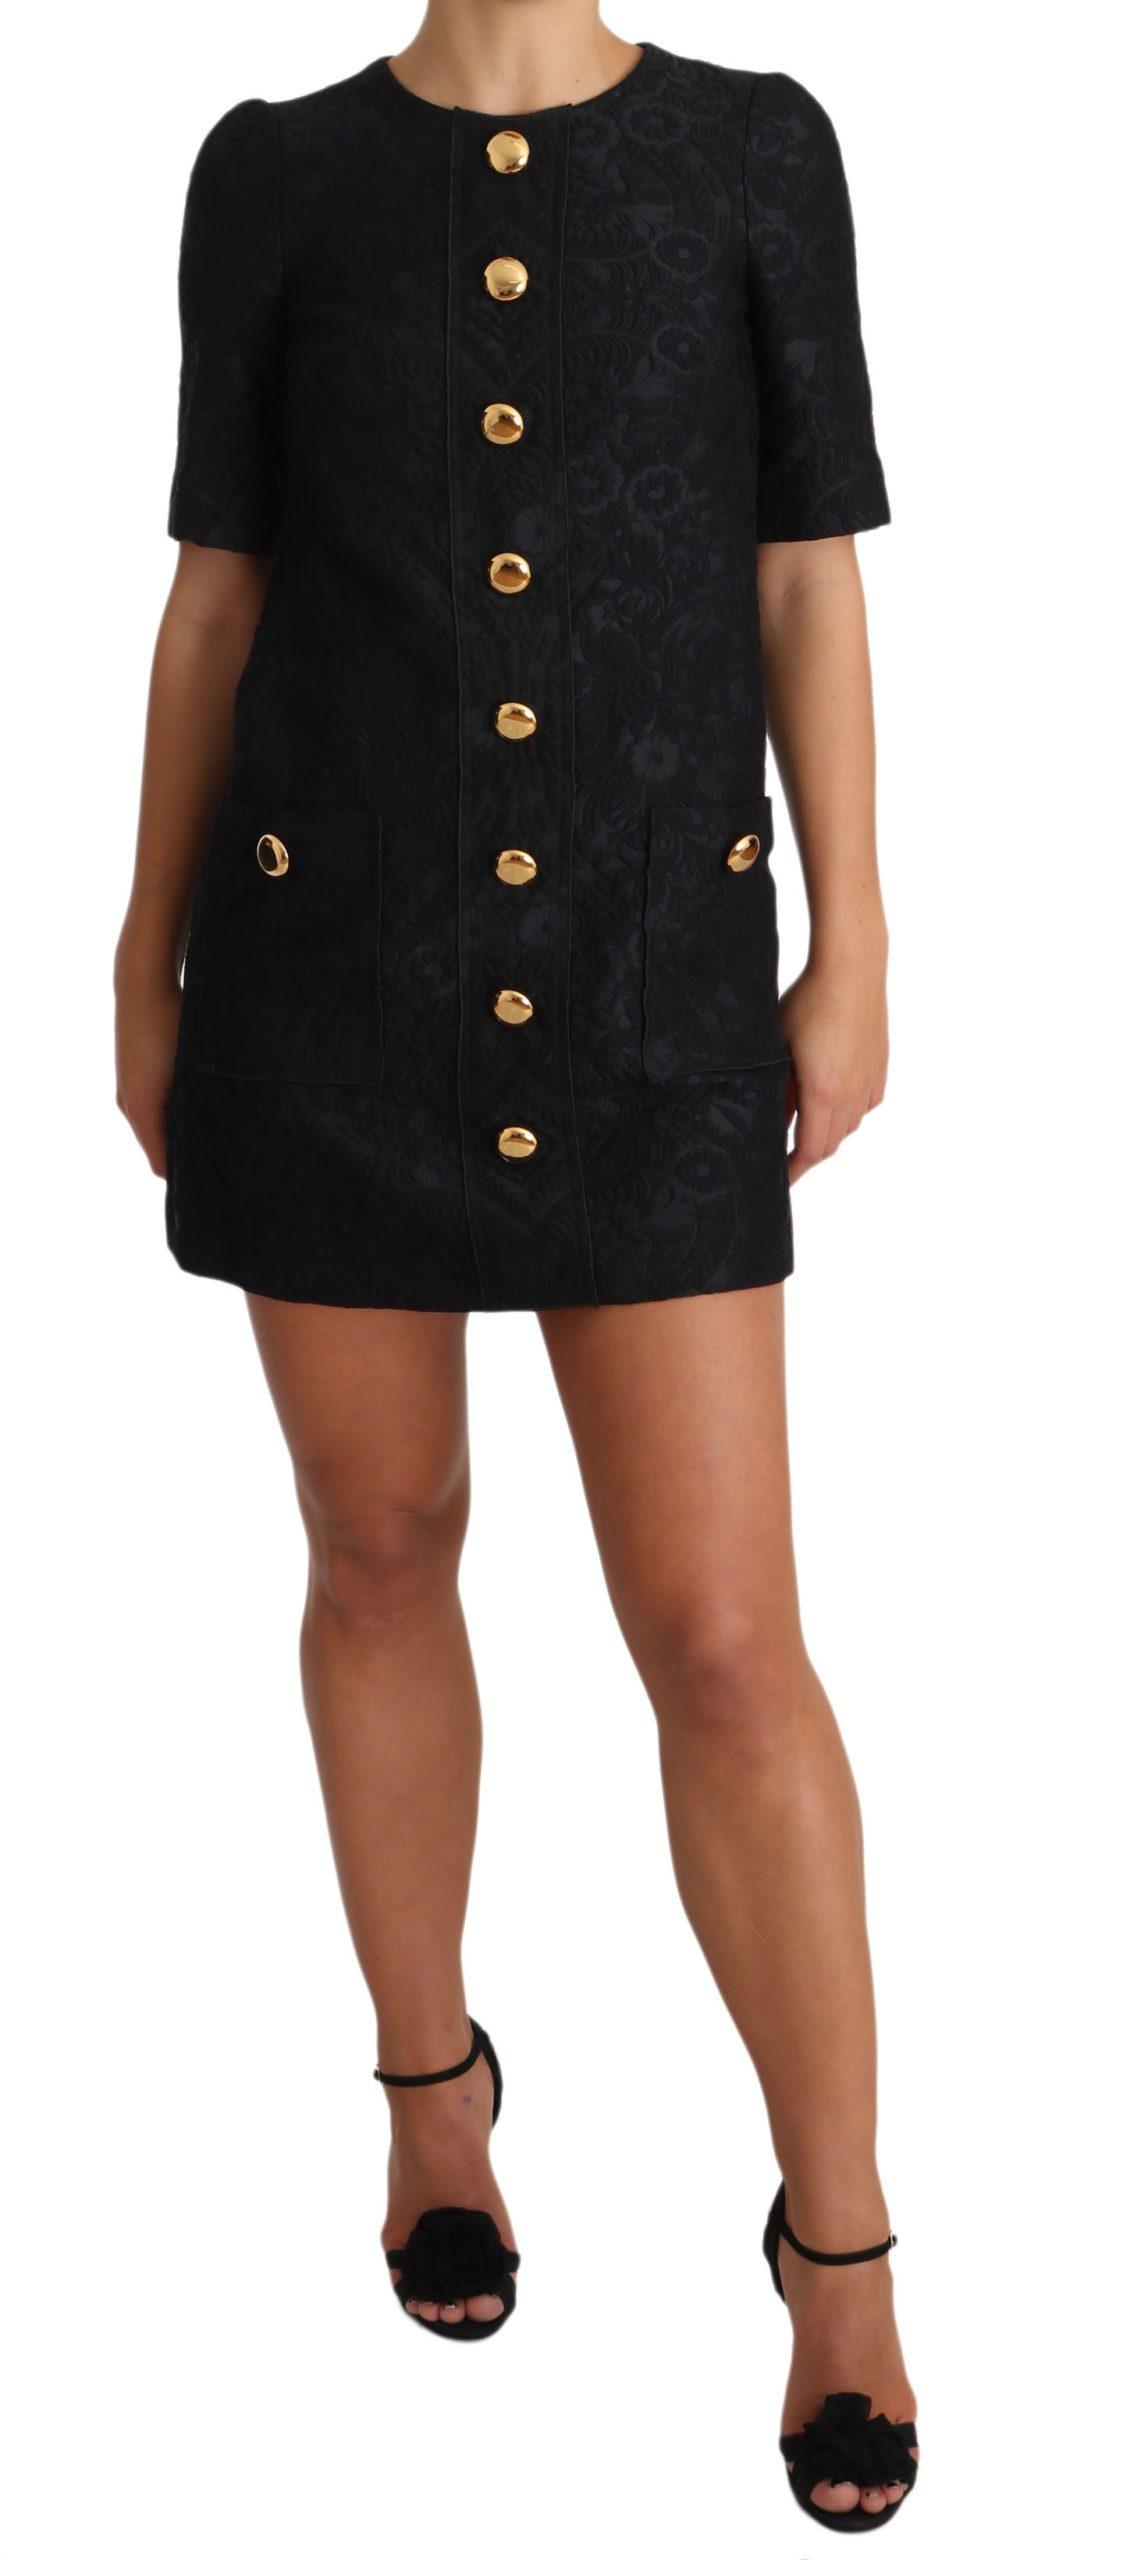 Dolce & Gabbana Women's Dress Black DR1931 - IT36 | XS